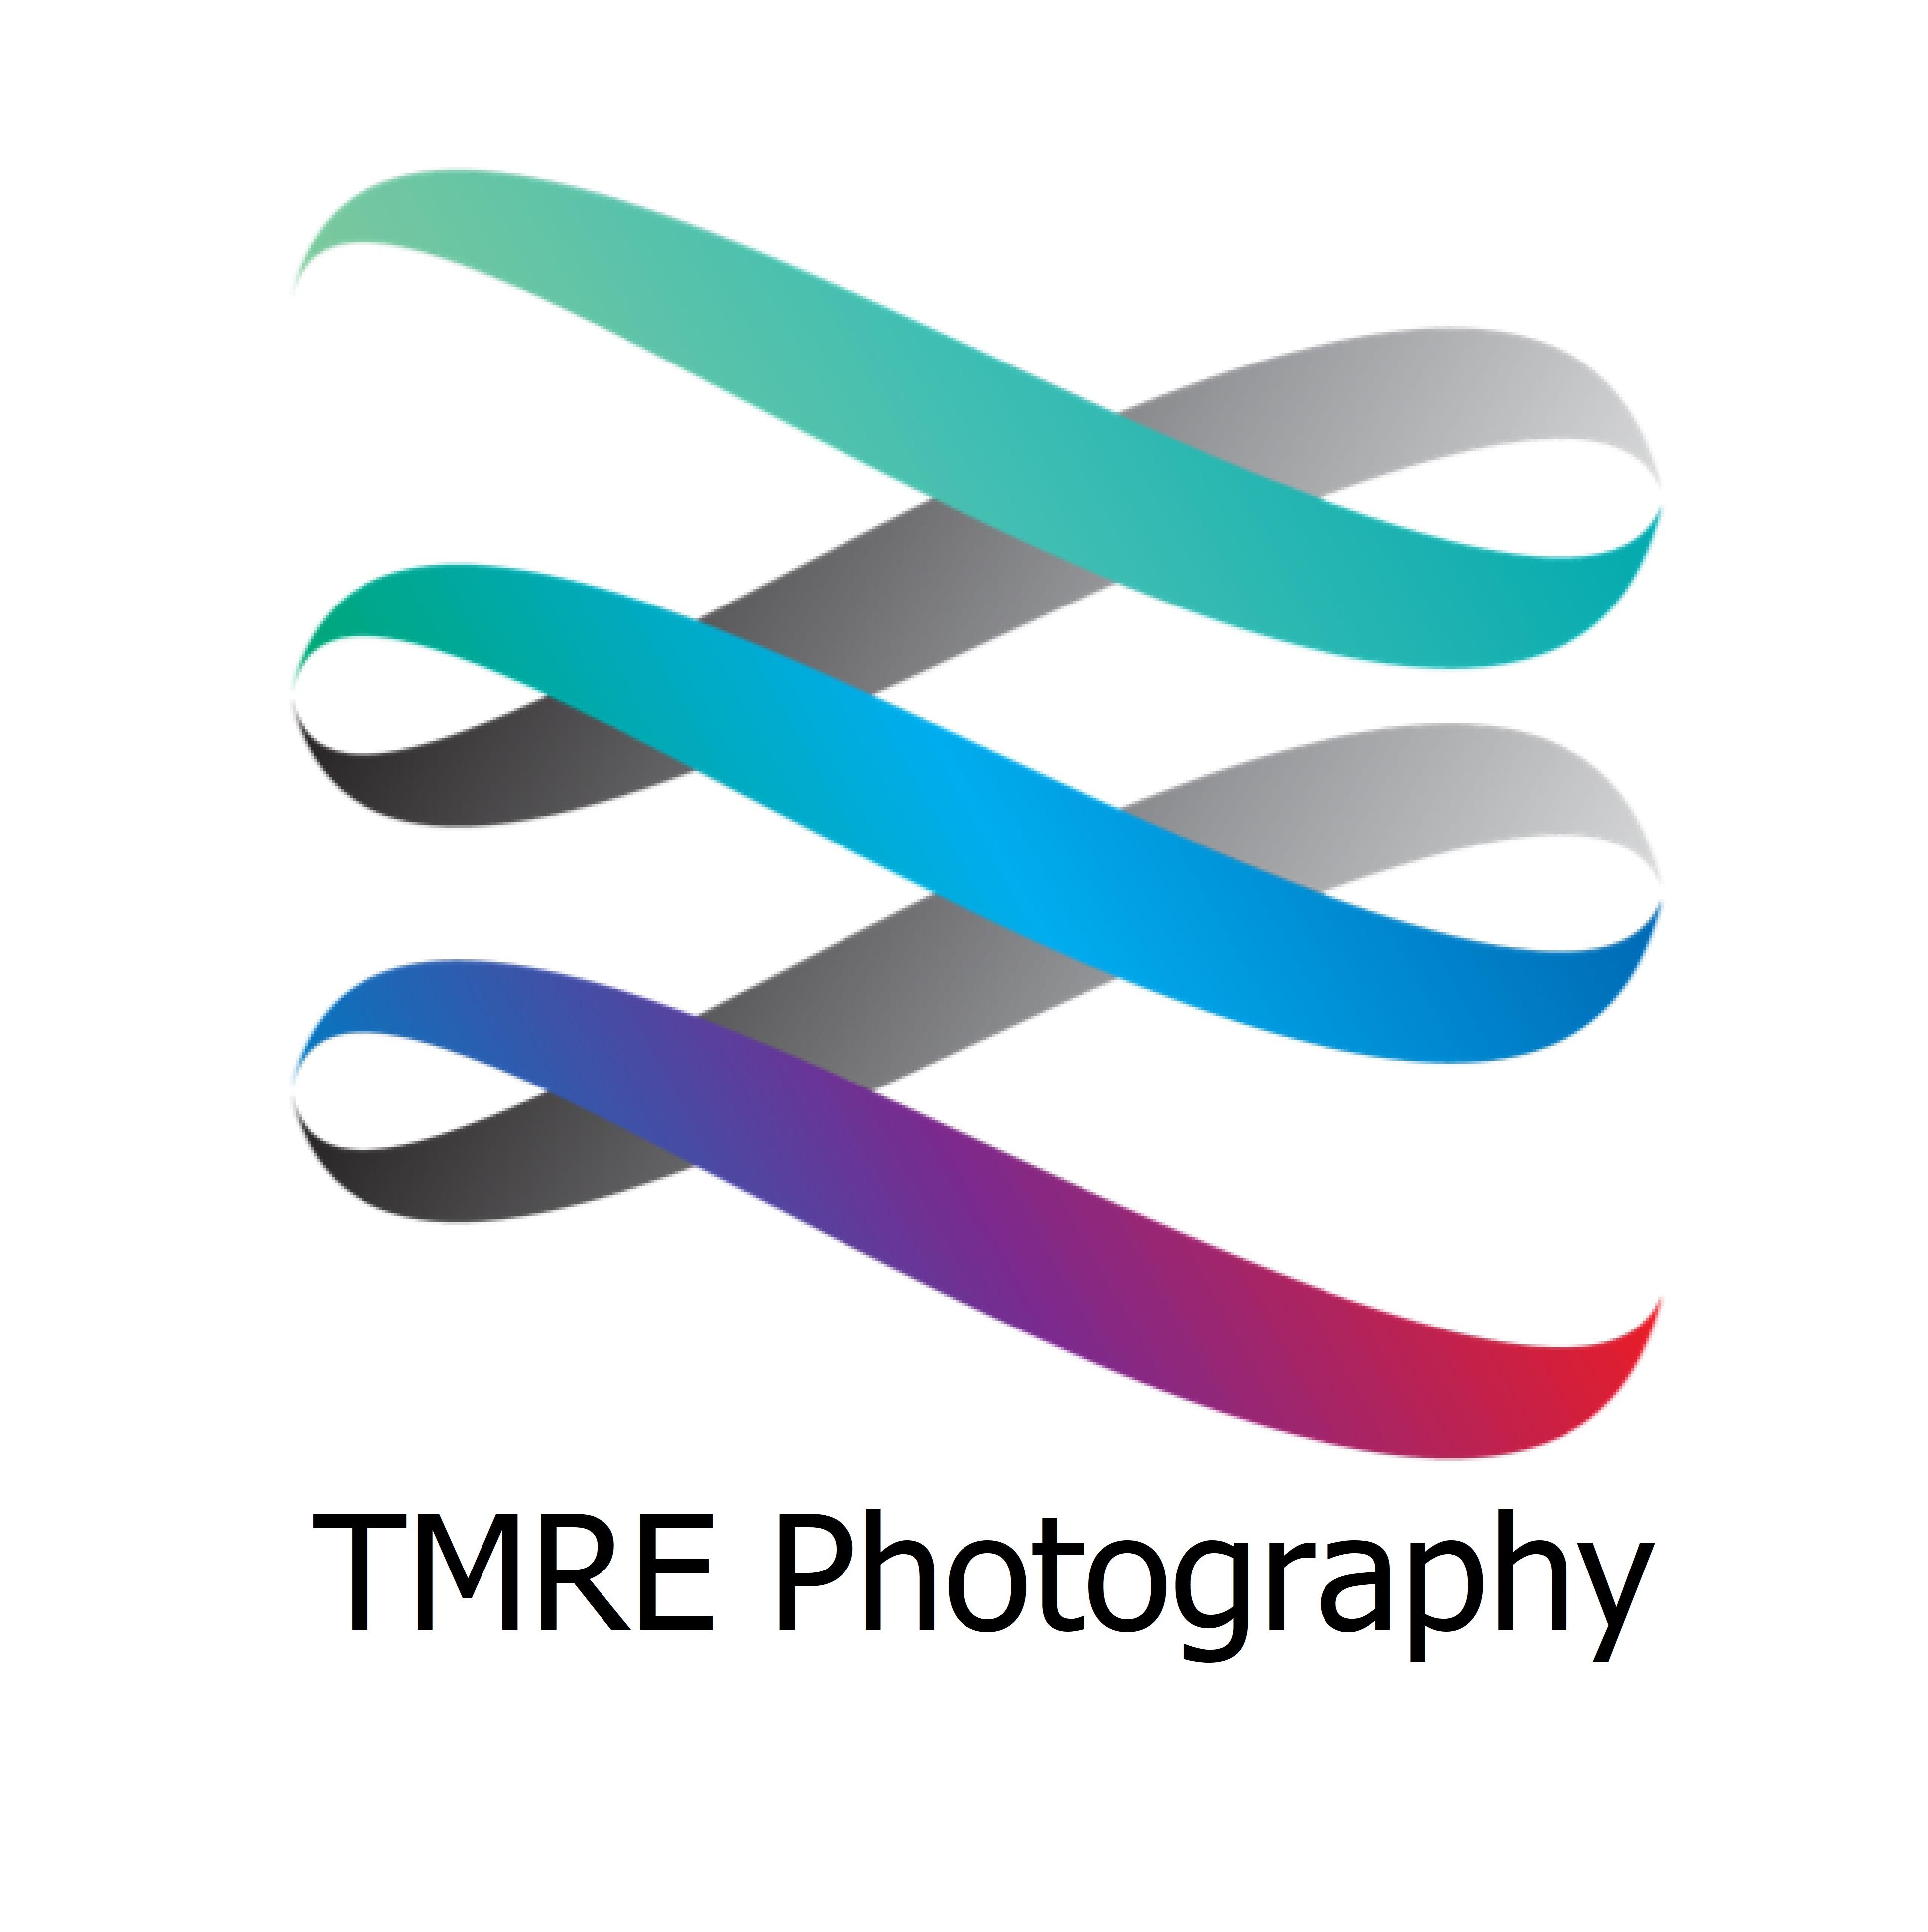 TMRE Photography